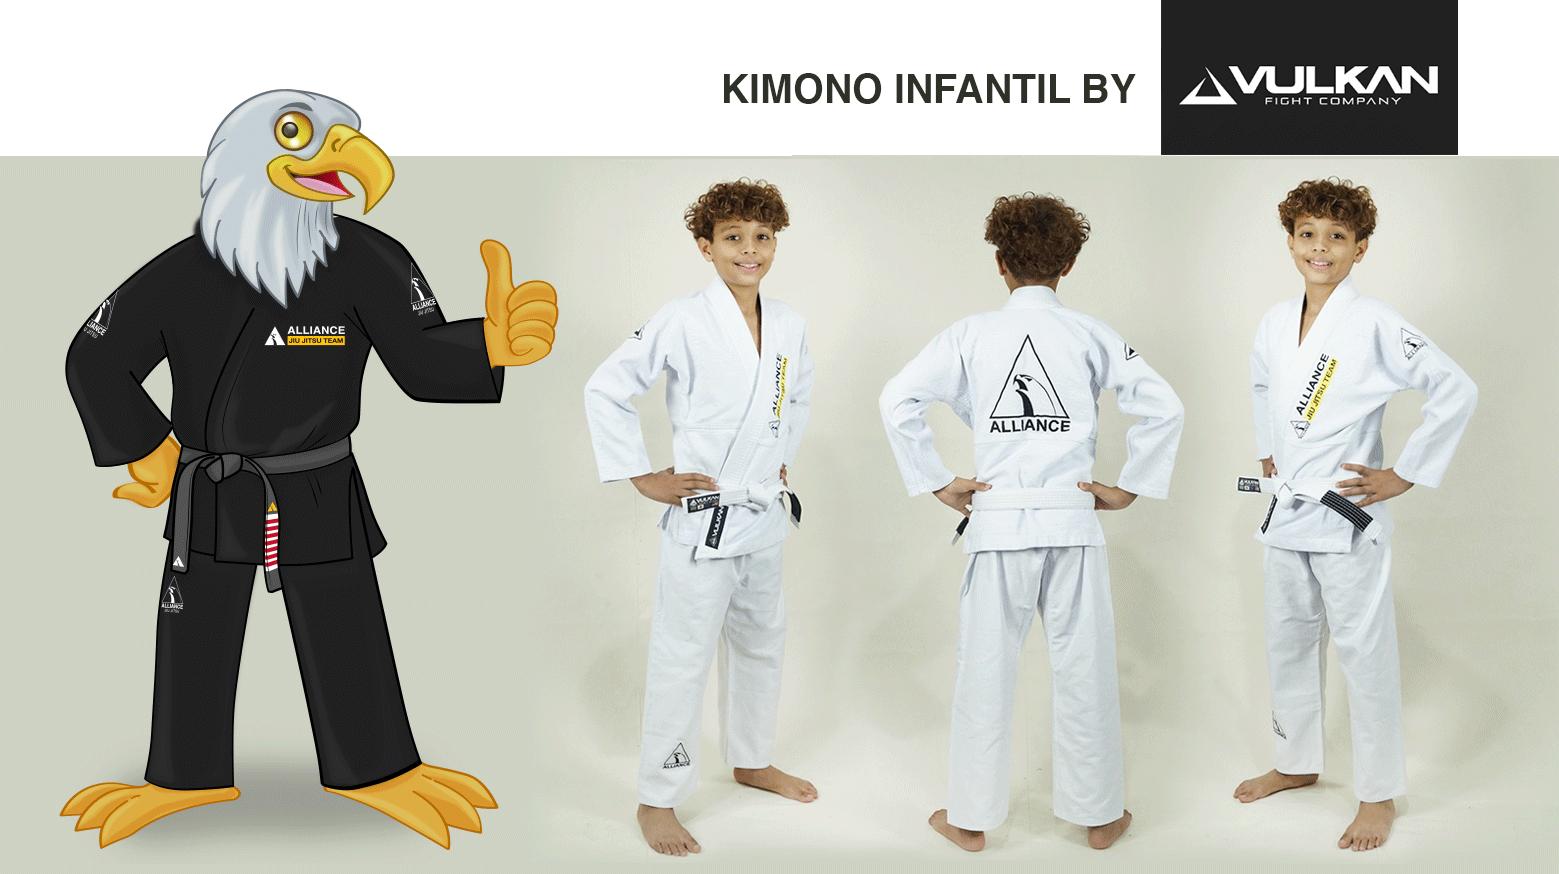 Kimono infantil Alliance by Vulkan preto